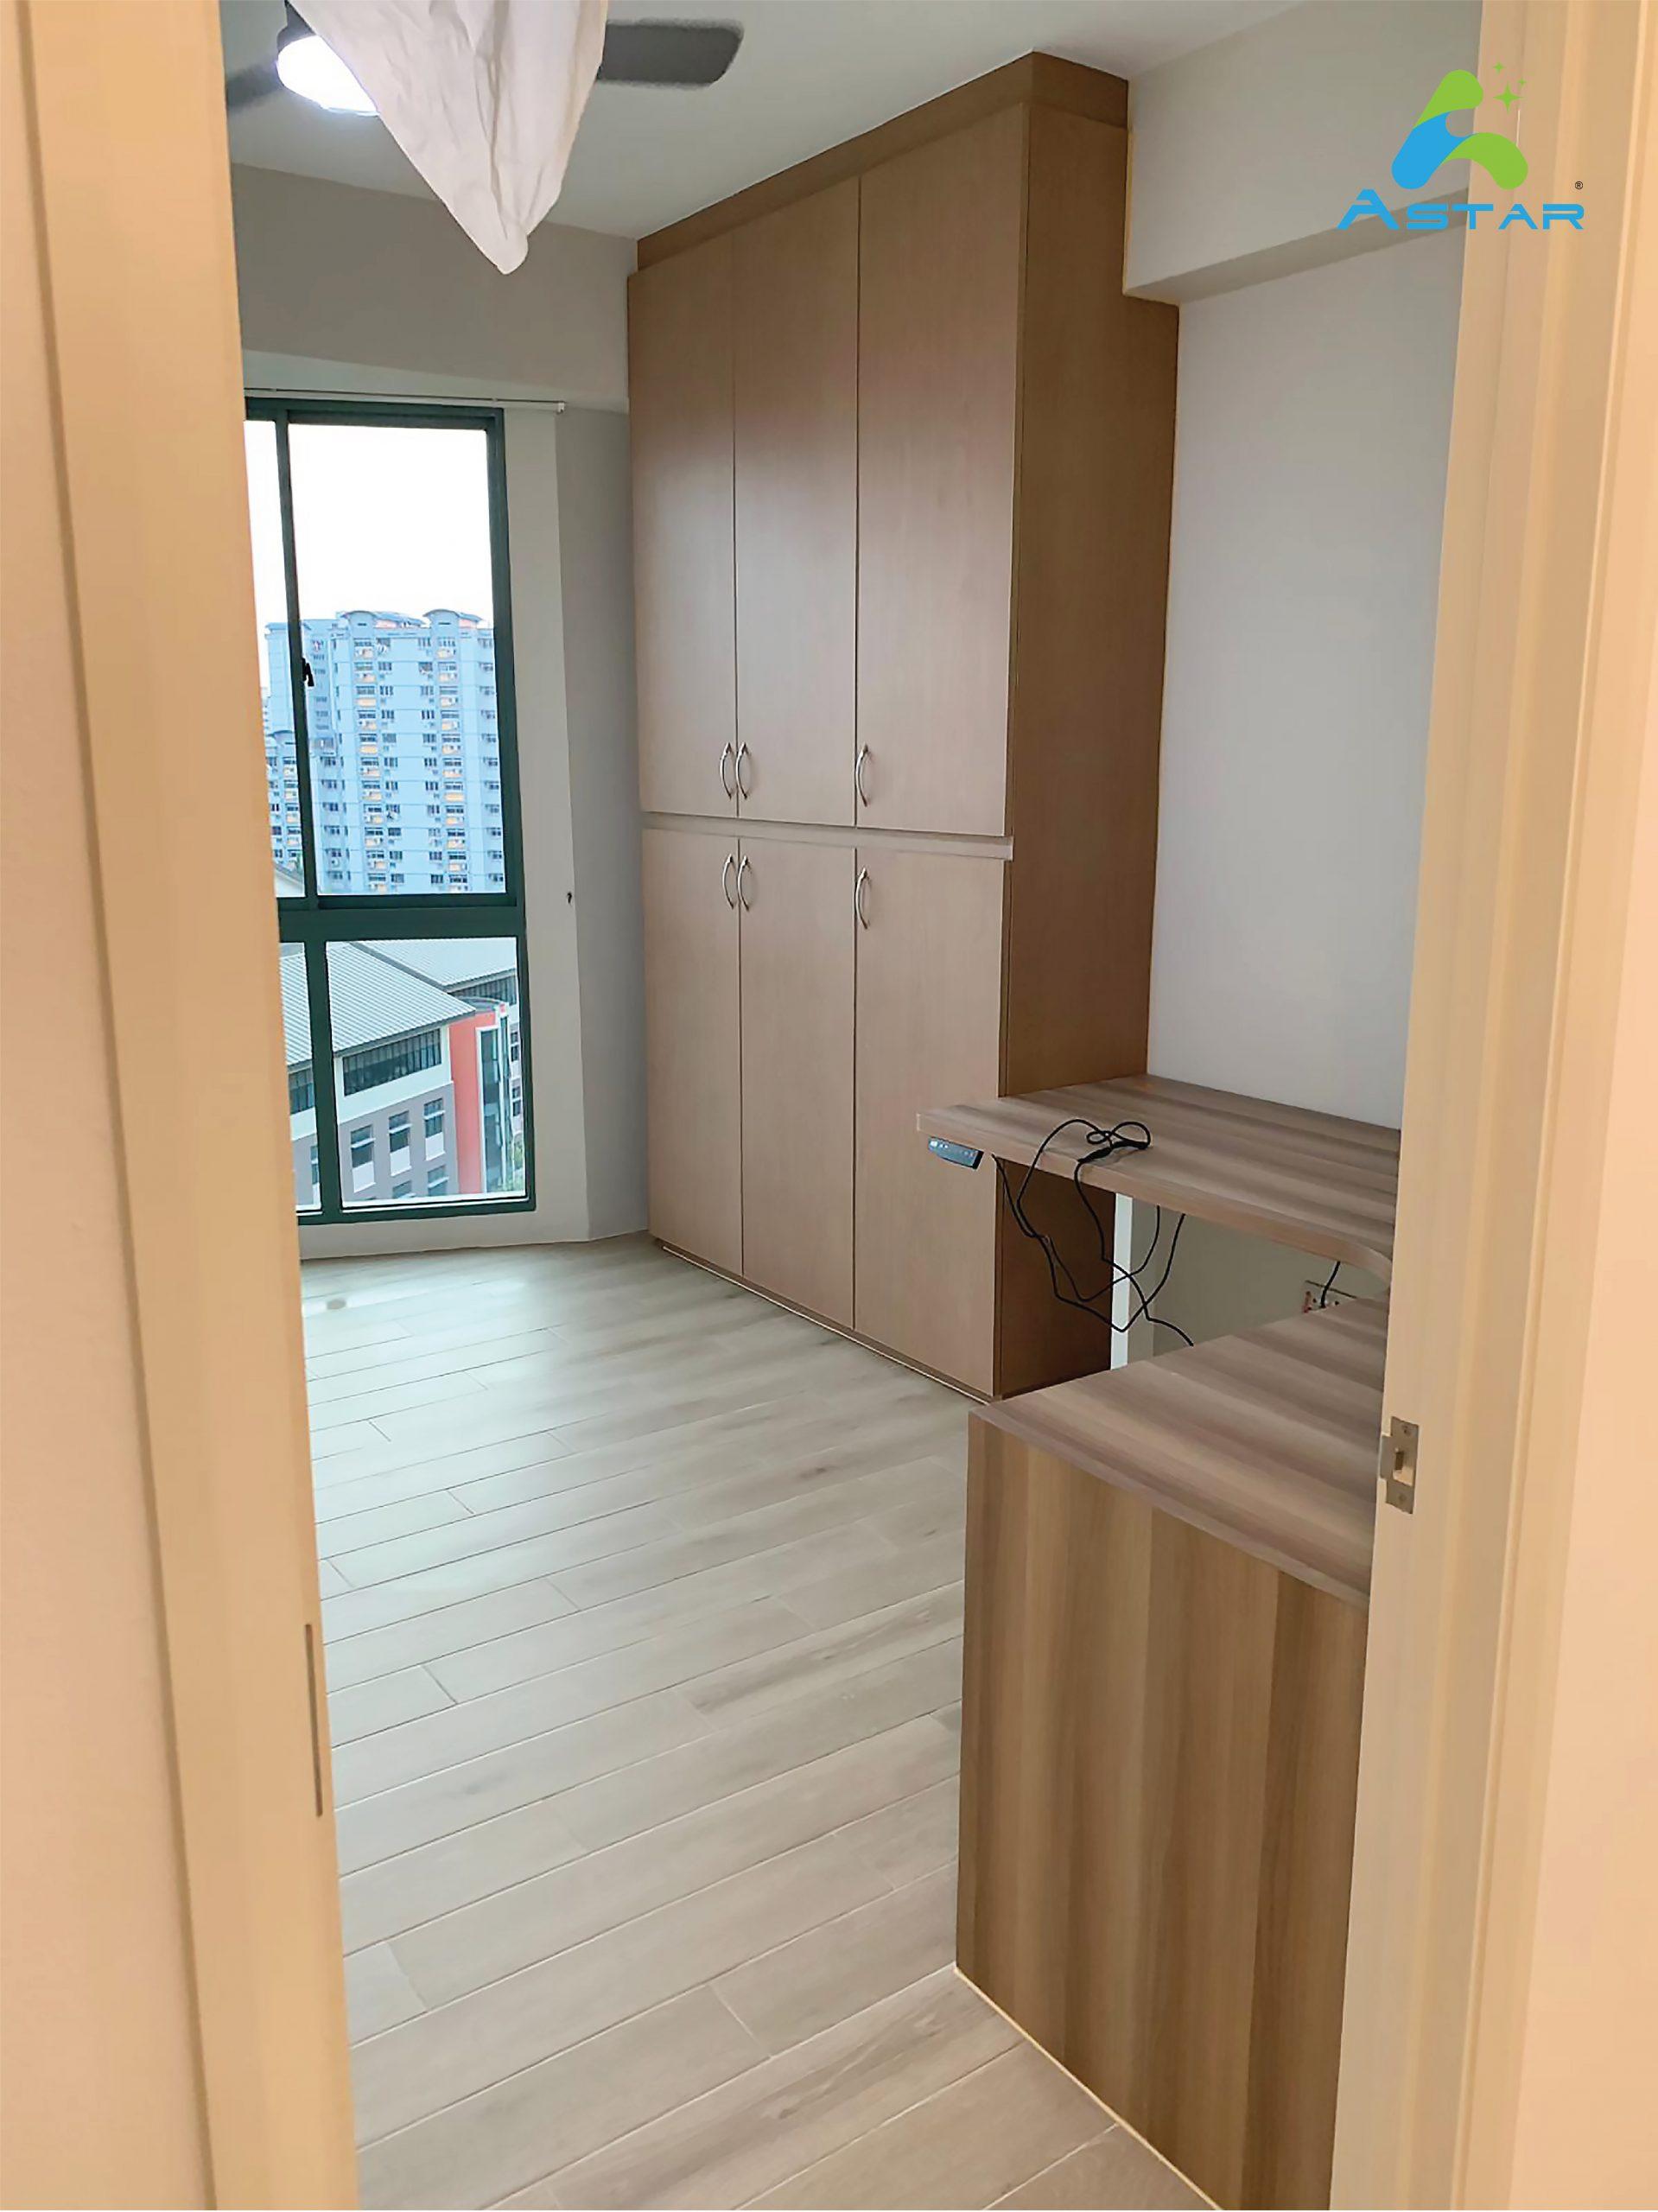 astar furnishing aluminum furniture projects Yew Mei Green Condominium 12